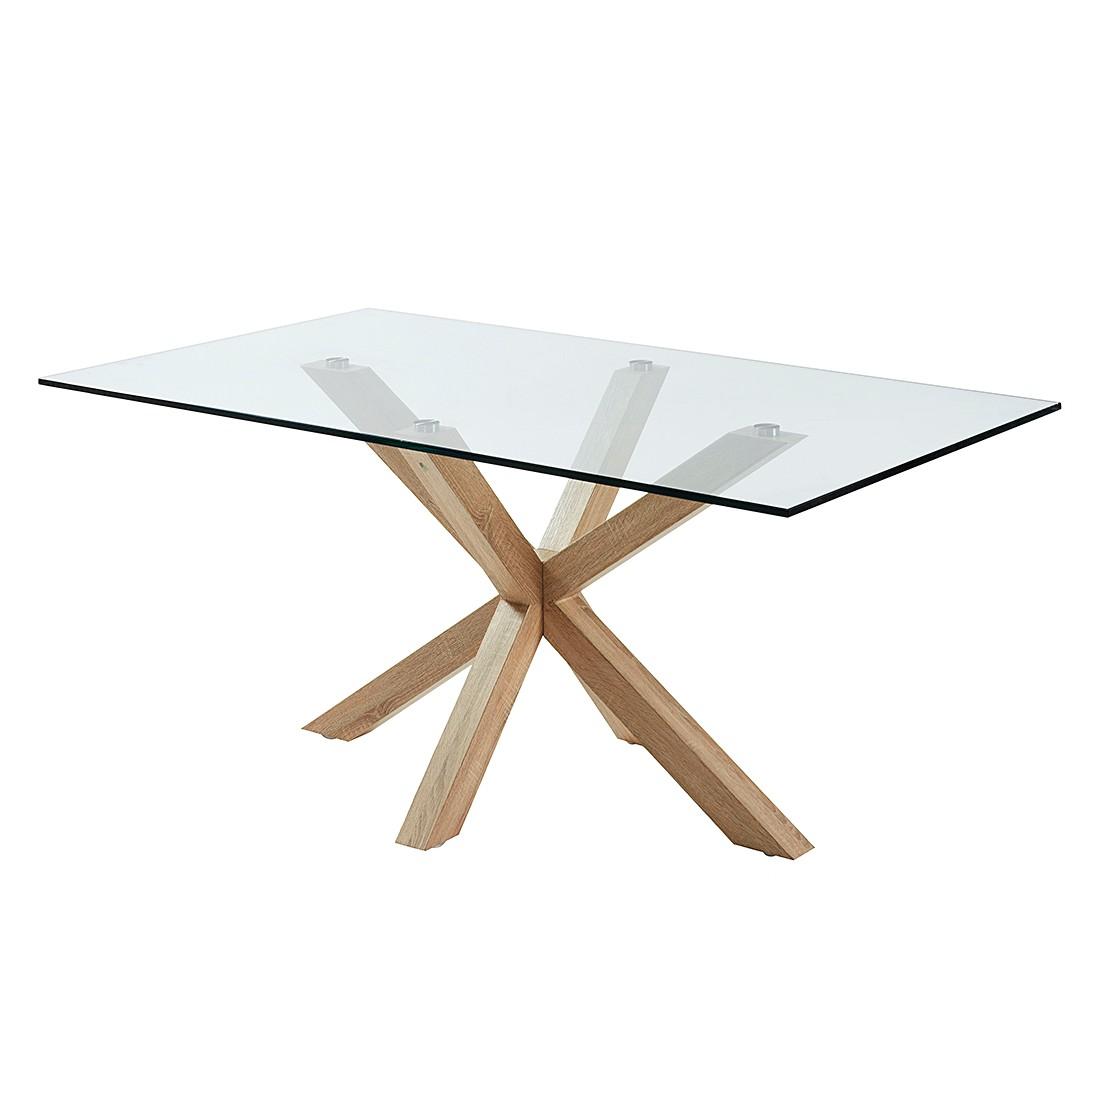 Table à manger Karmi - Verre clair / Chêne, Morteens